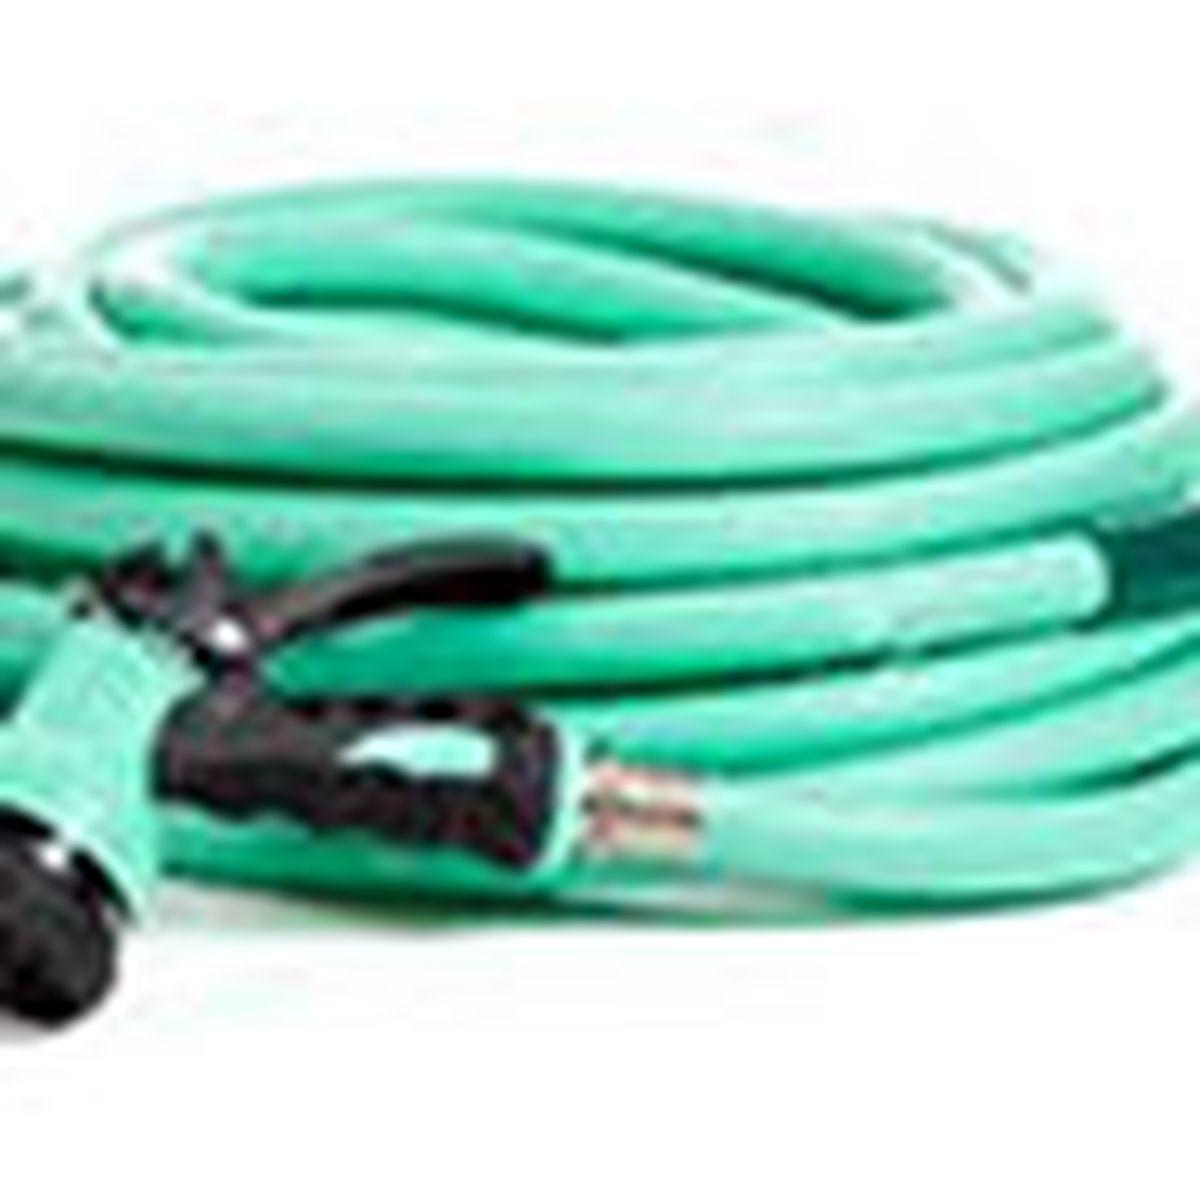 garden hose with nozzle